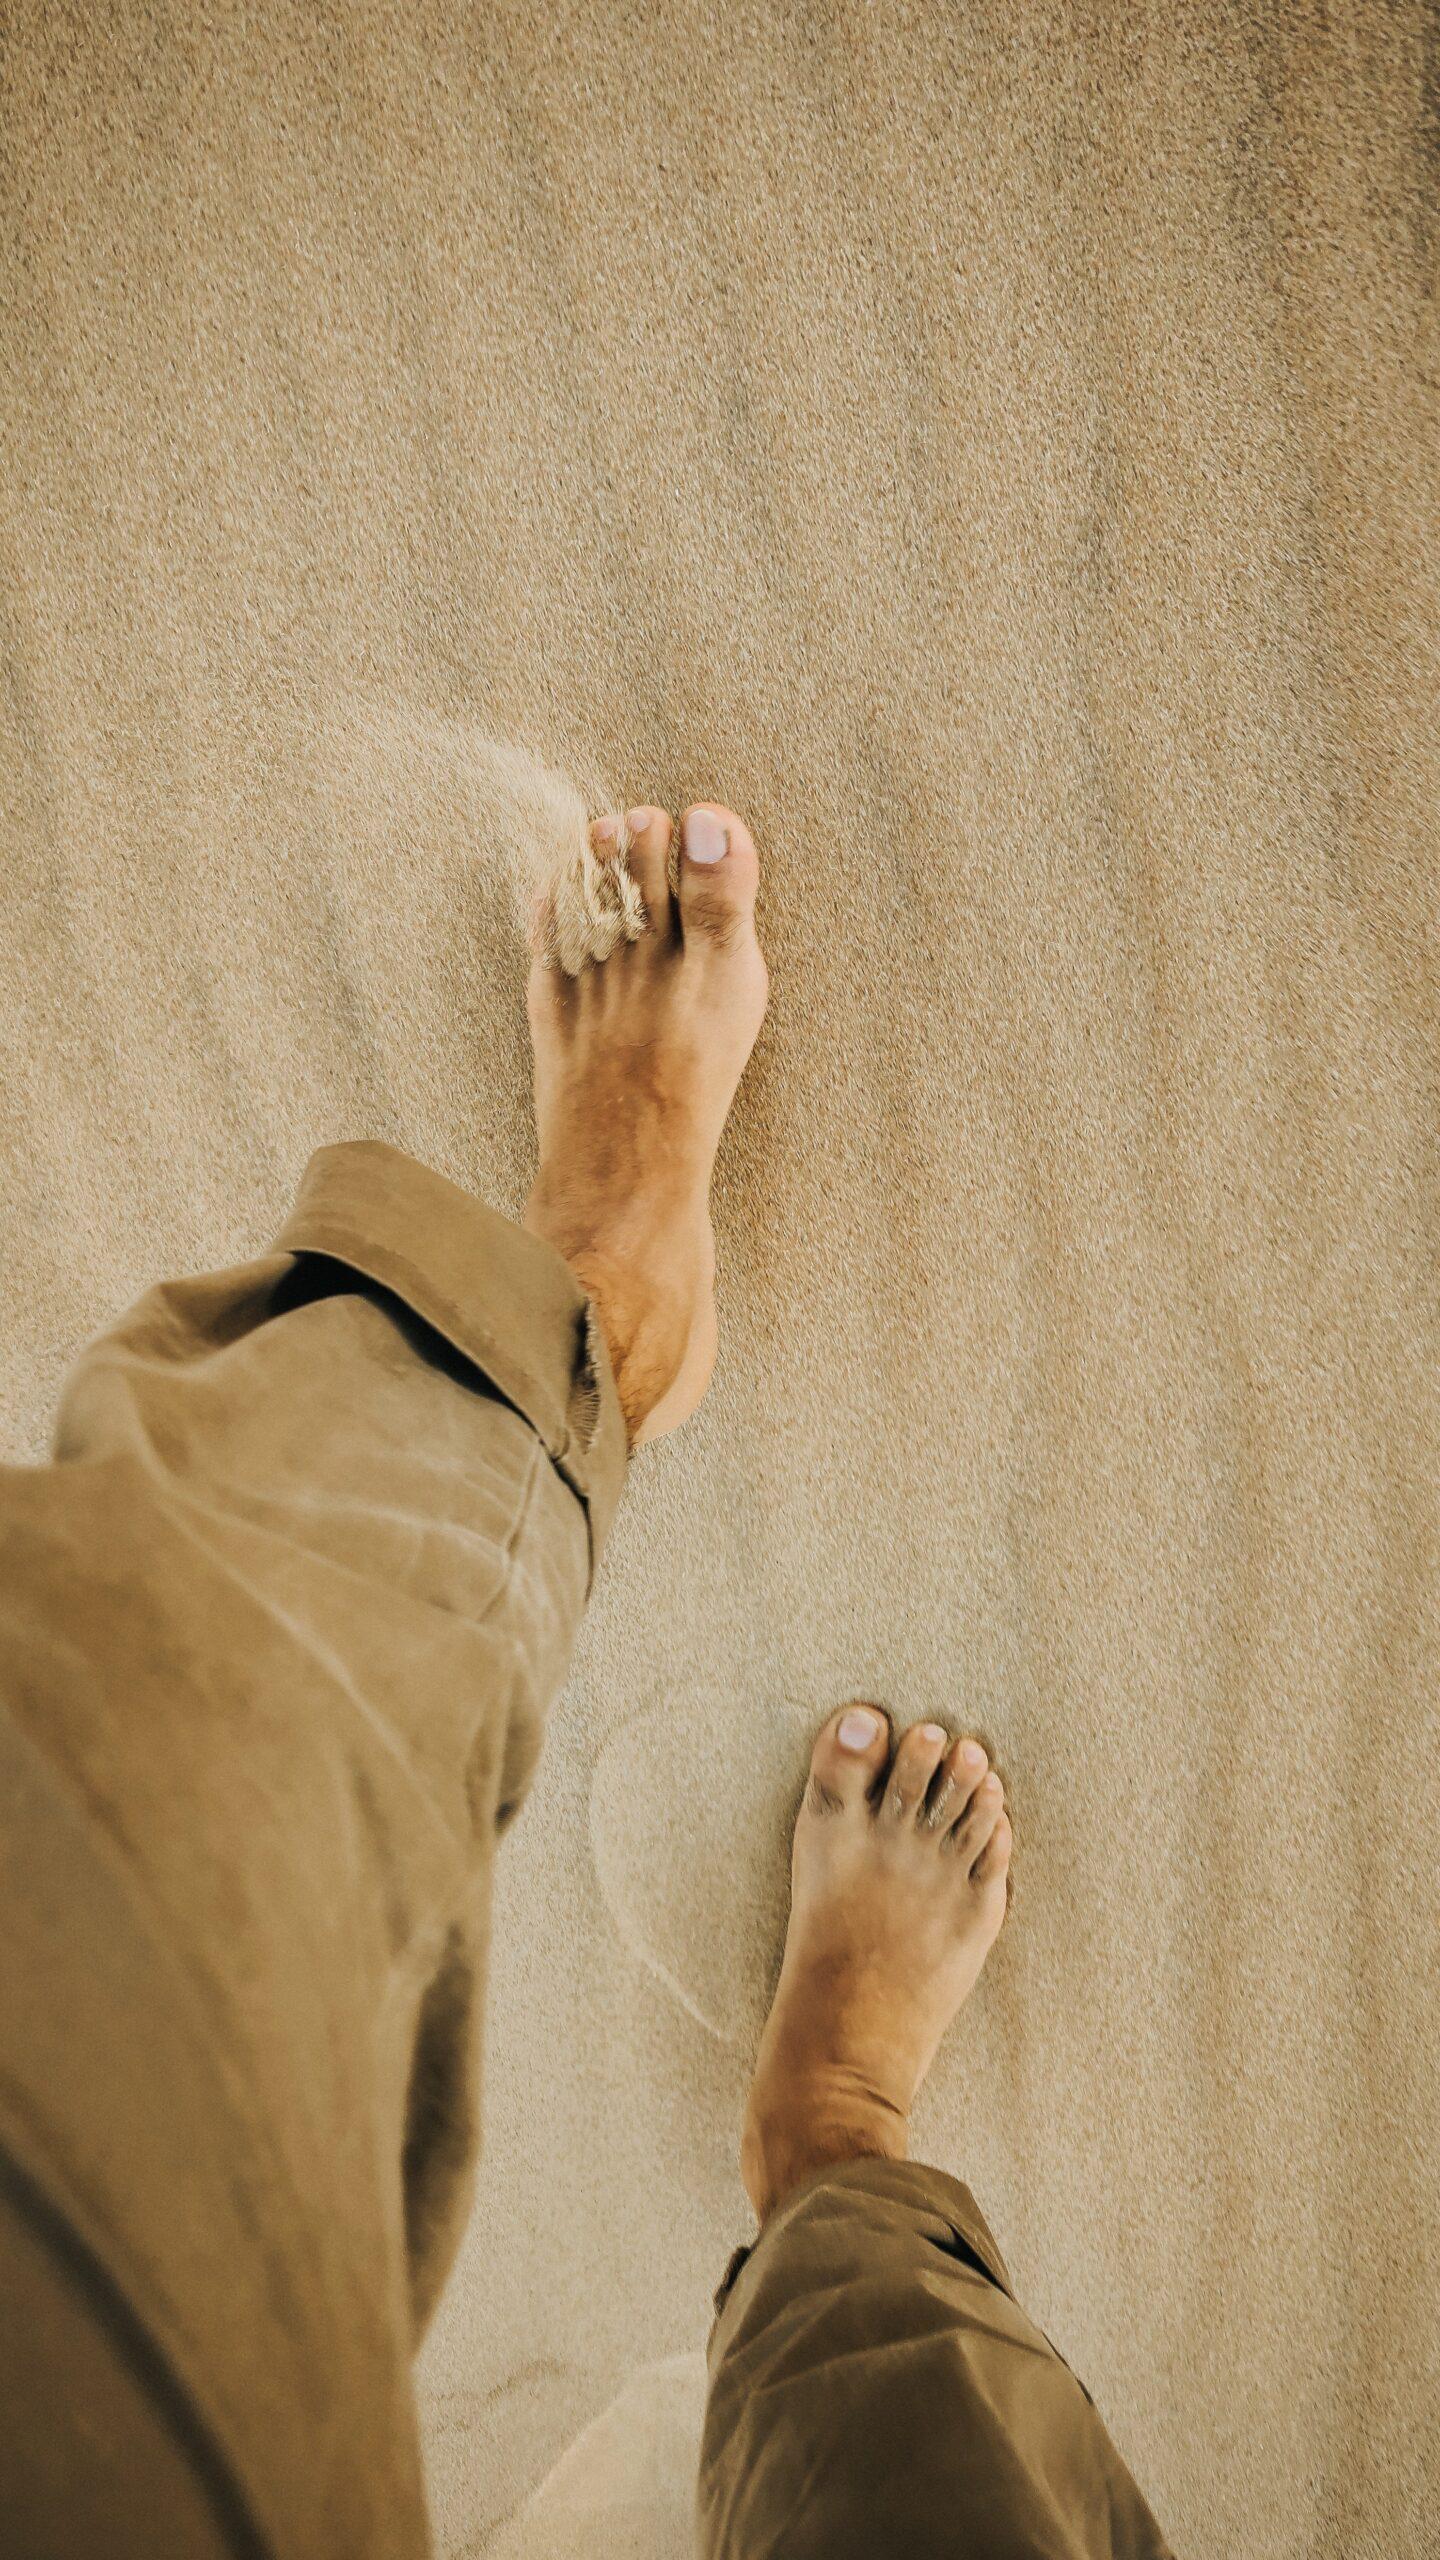 Man walking in sand